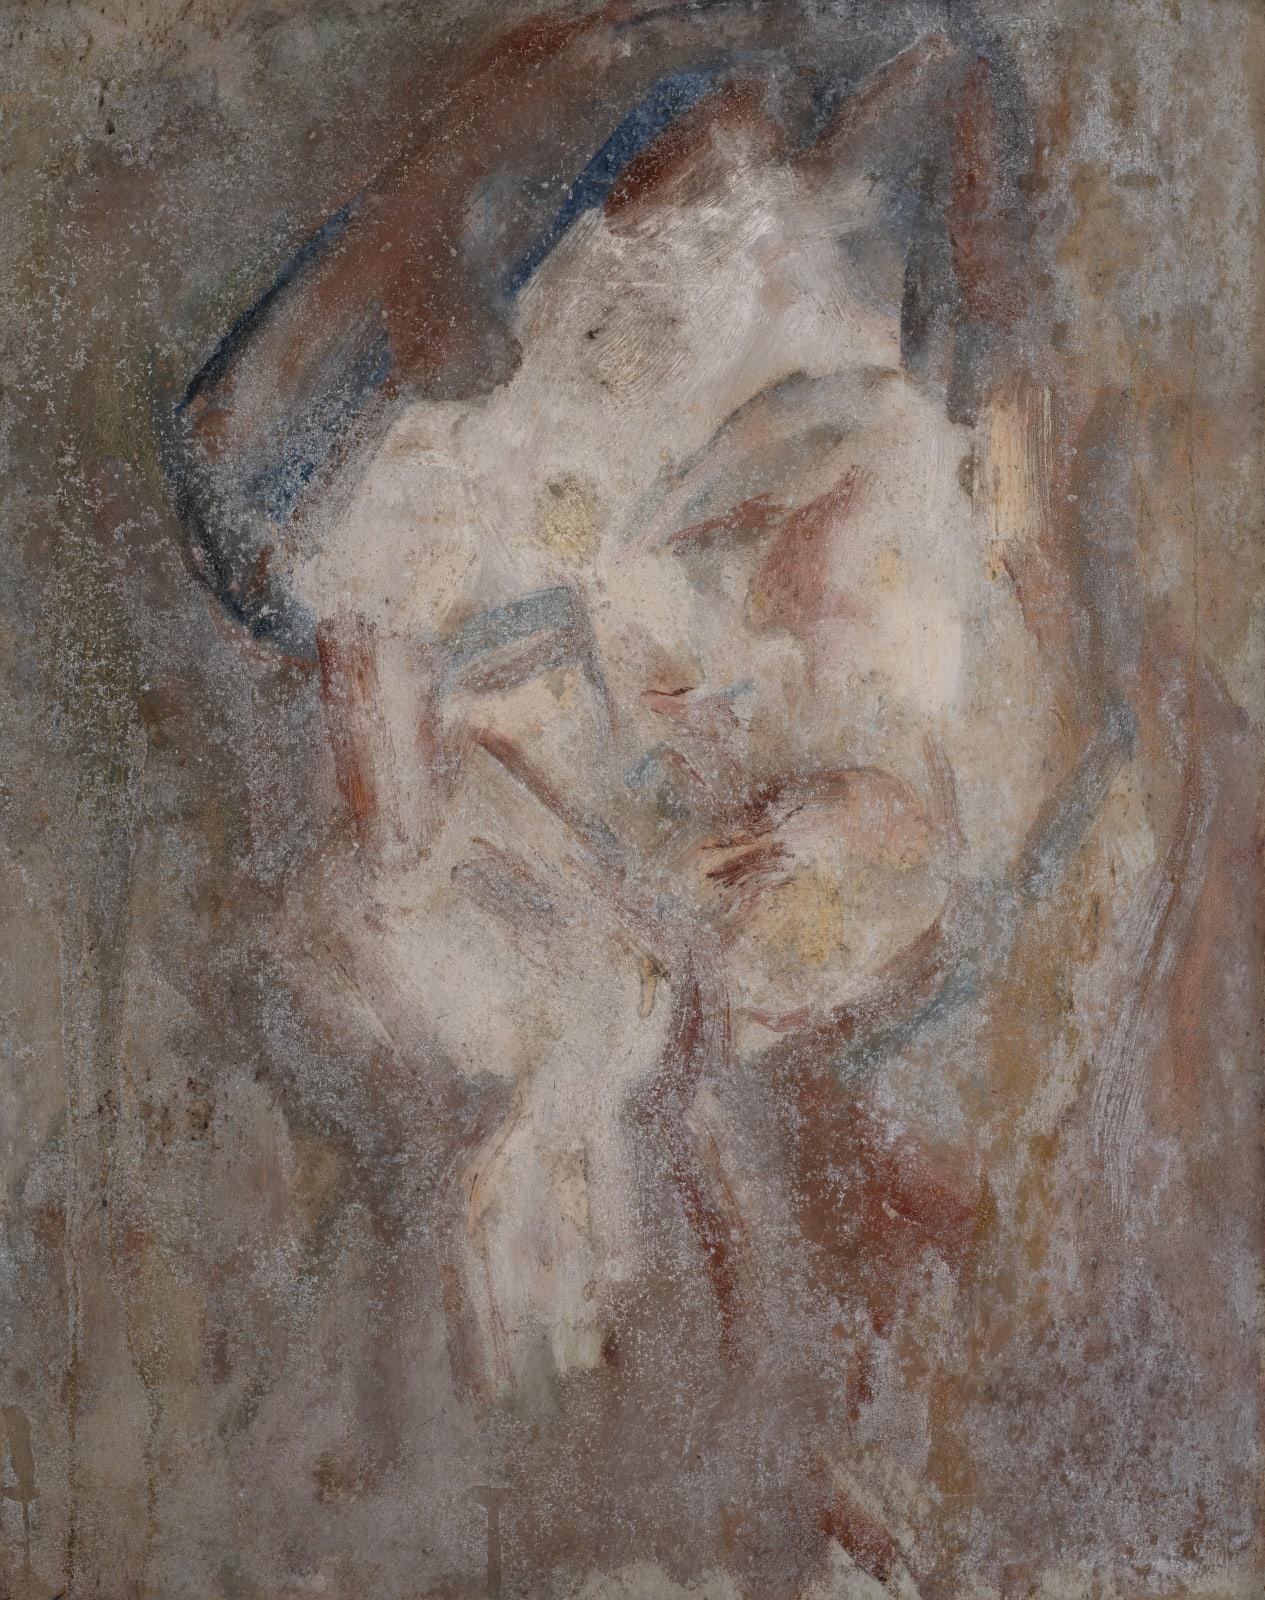 Gustav Metzger Head of a Man, c. 1951-1953 Oil on board 50.6 x 40cm. The Gustav Metzger Foundation